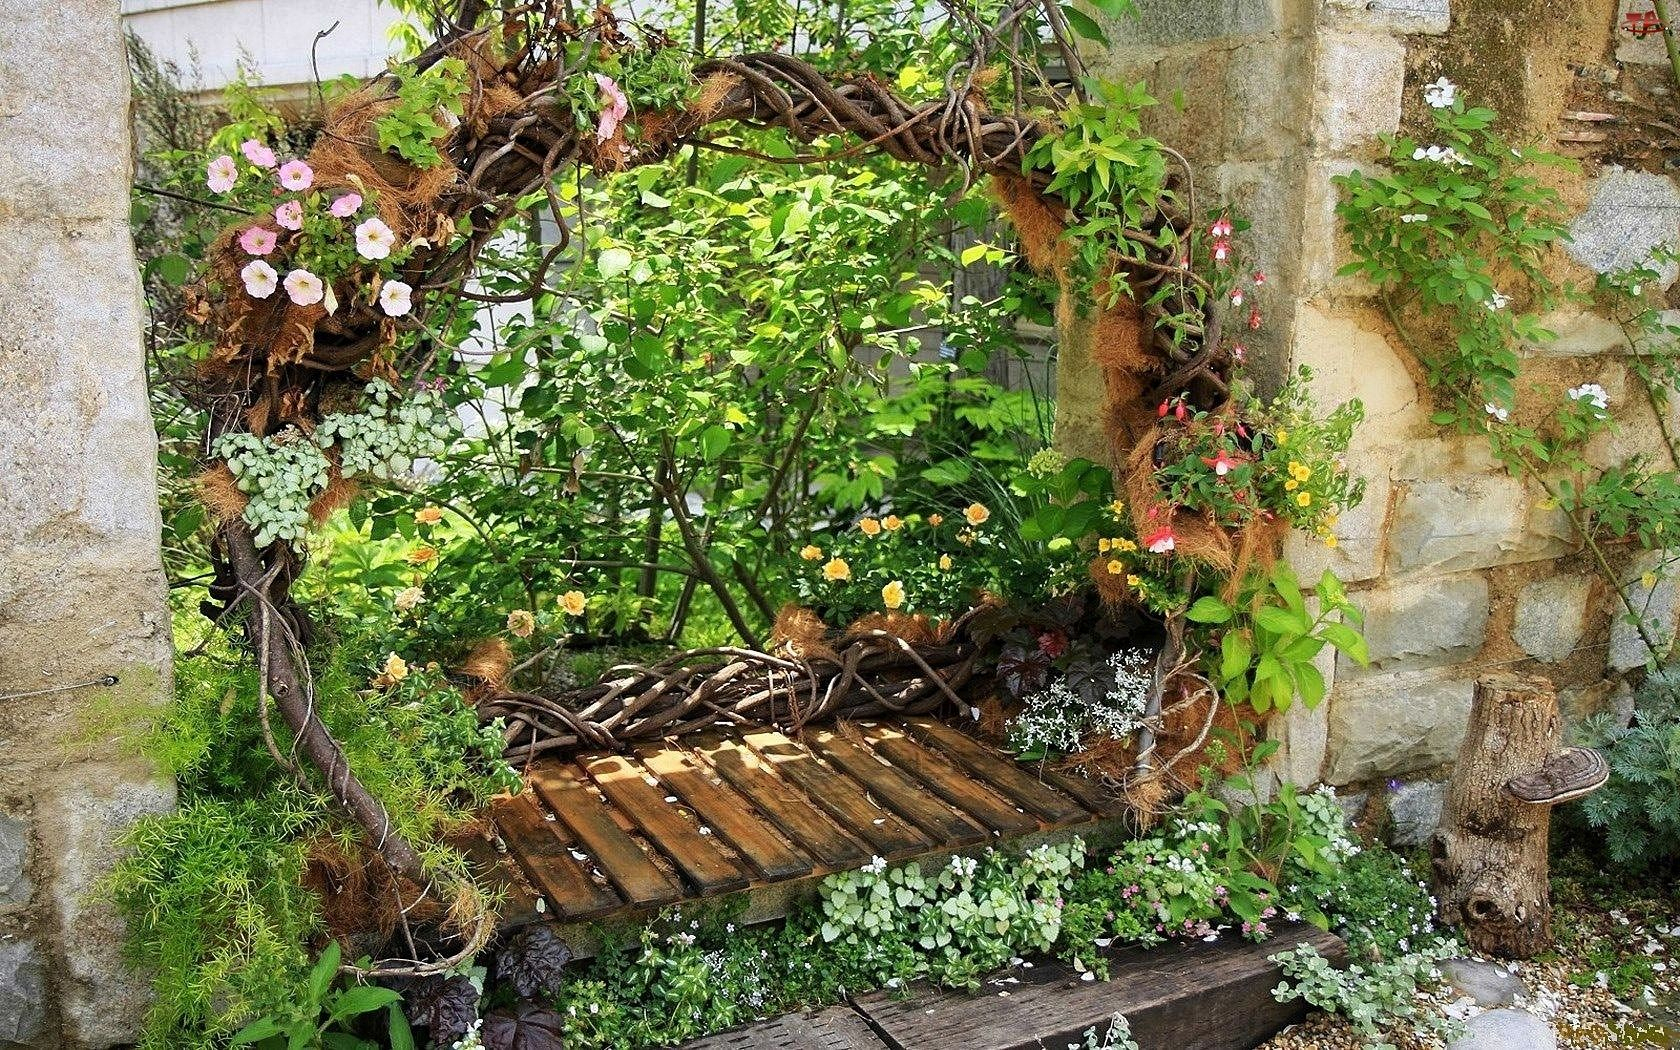 125629.jpg (1680×1050) | Jardin Original, Balancoire Jardin dedans Idée De Génie Jardin